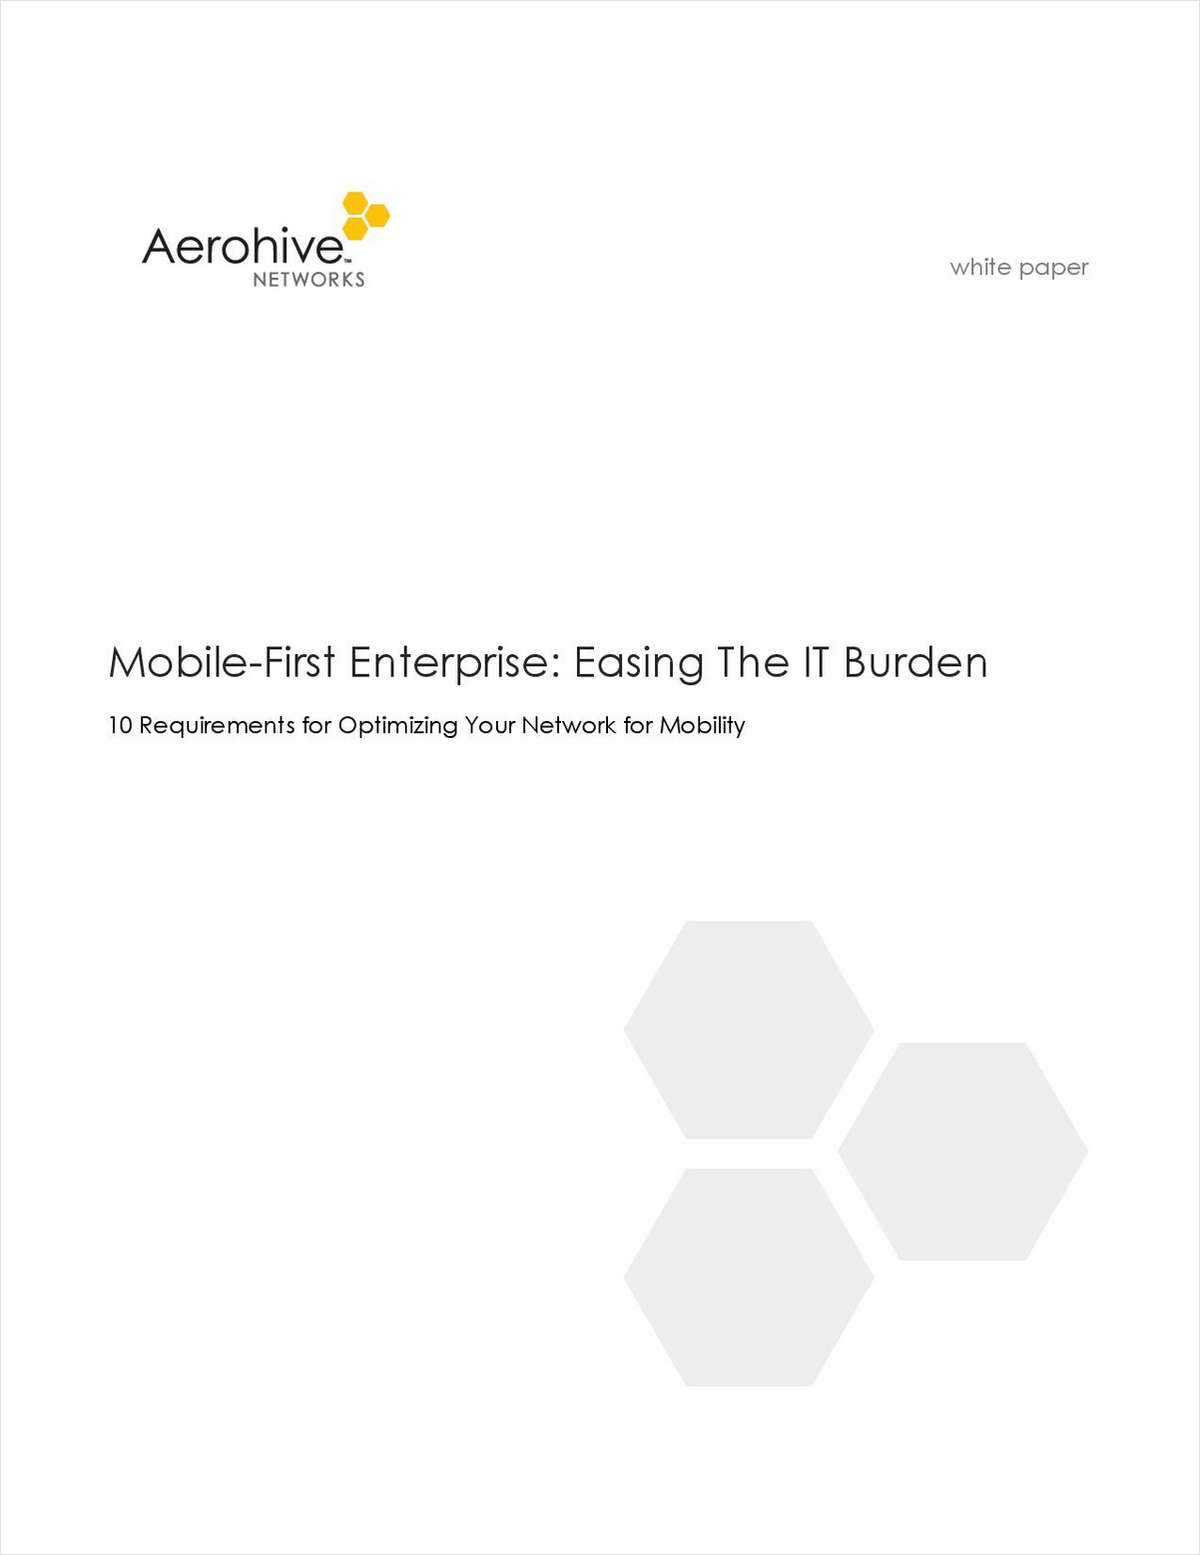 Mobile-First Enterprise: Easing The IT Burden